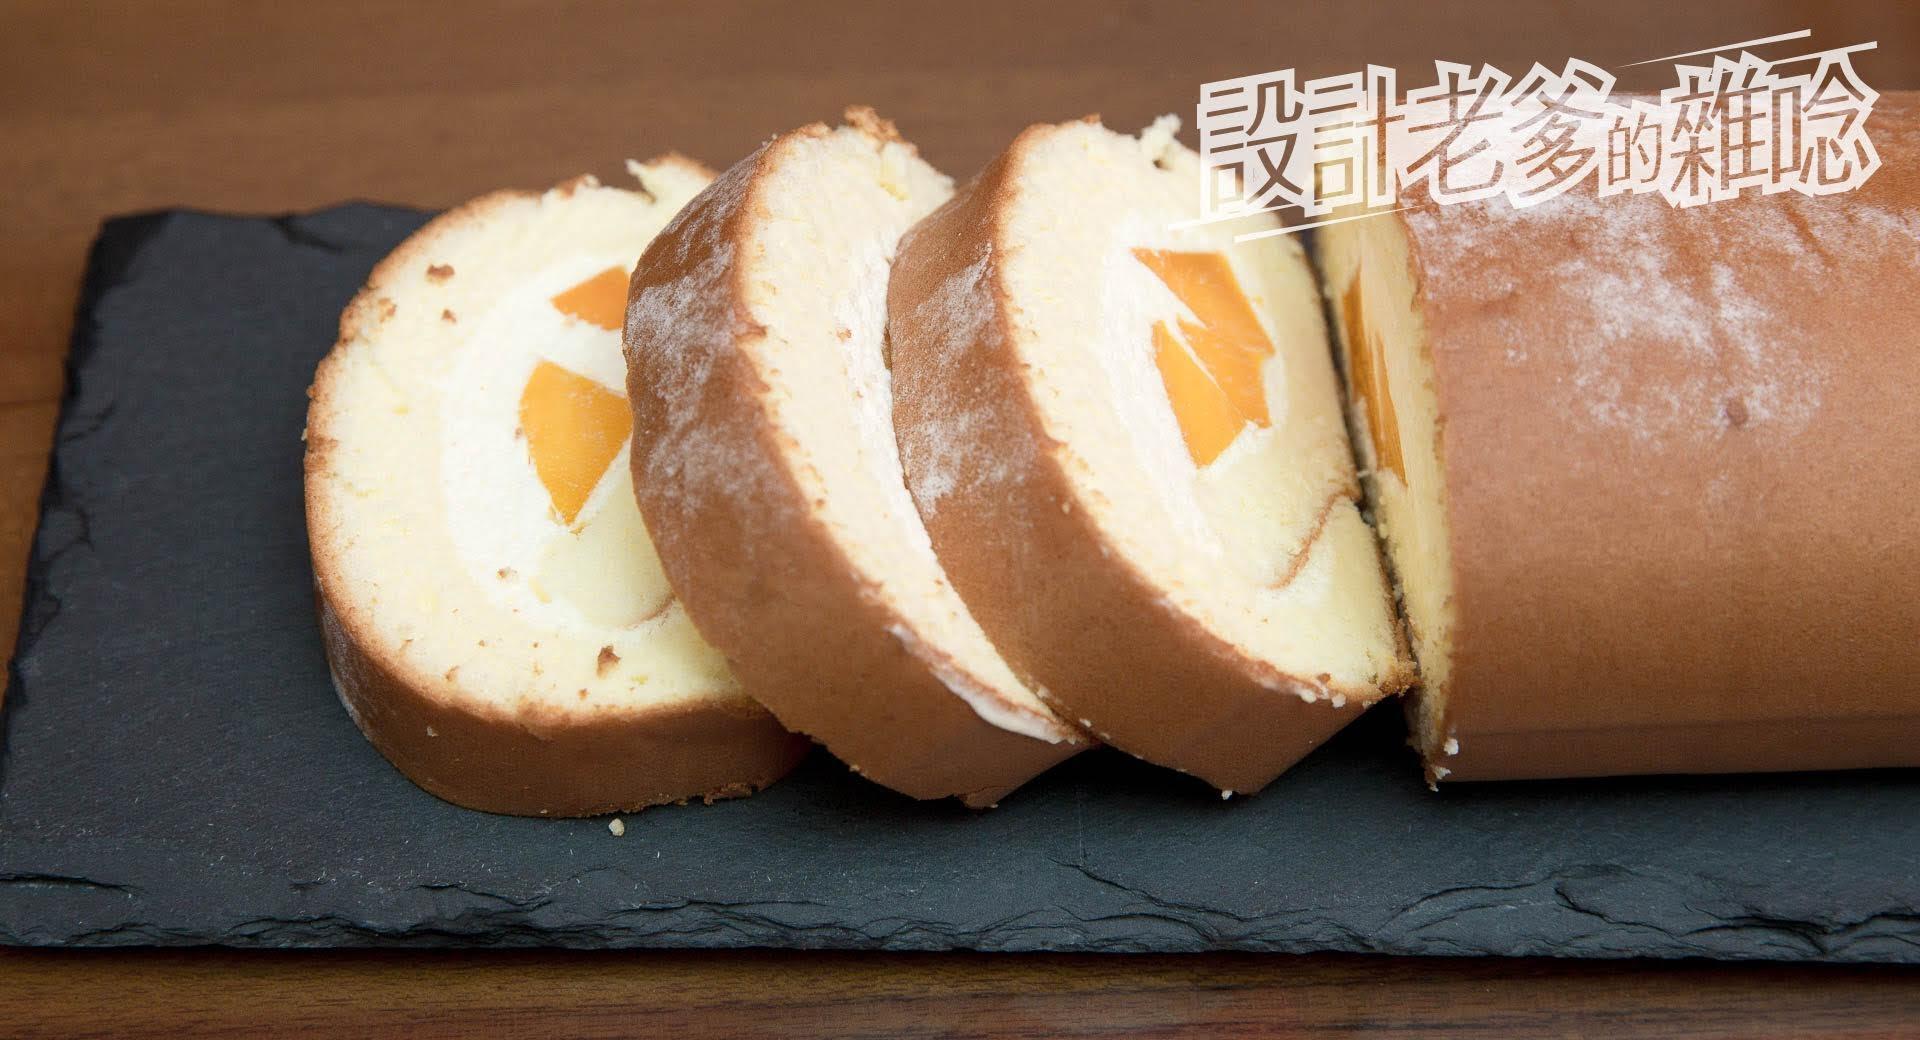 VitaDolce甜蜜生活手作甜點...最開心的痛苦芒果生乳捲試吃員